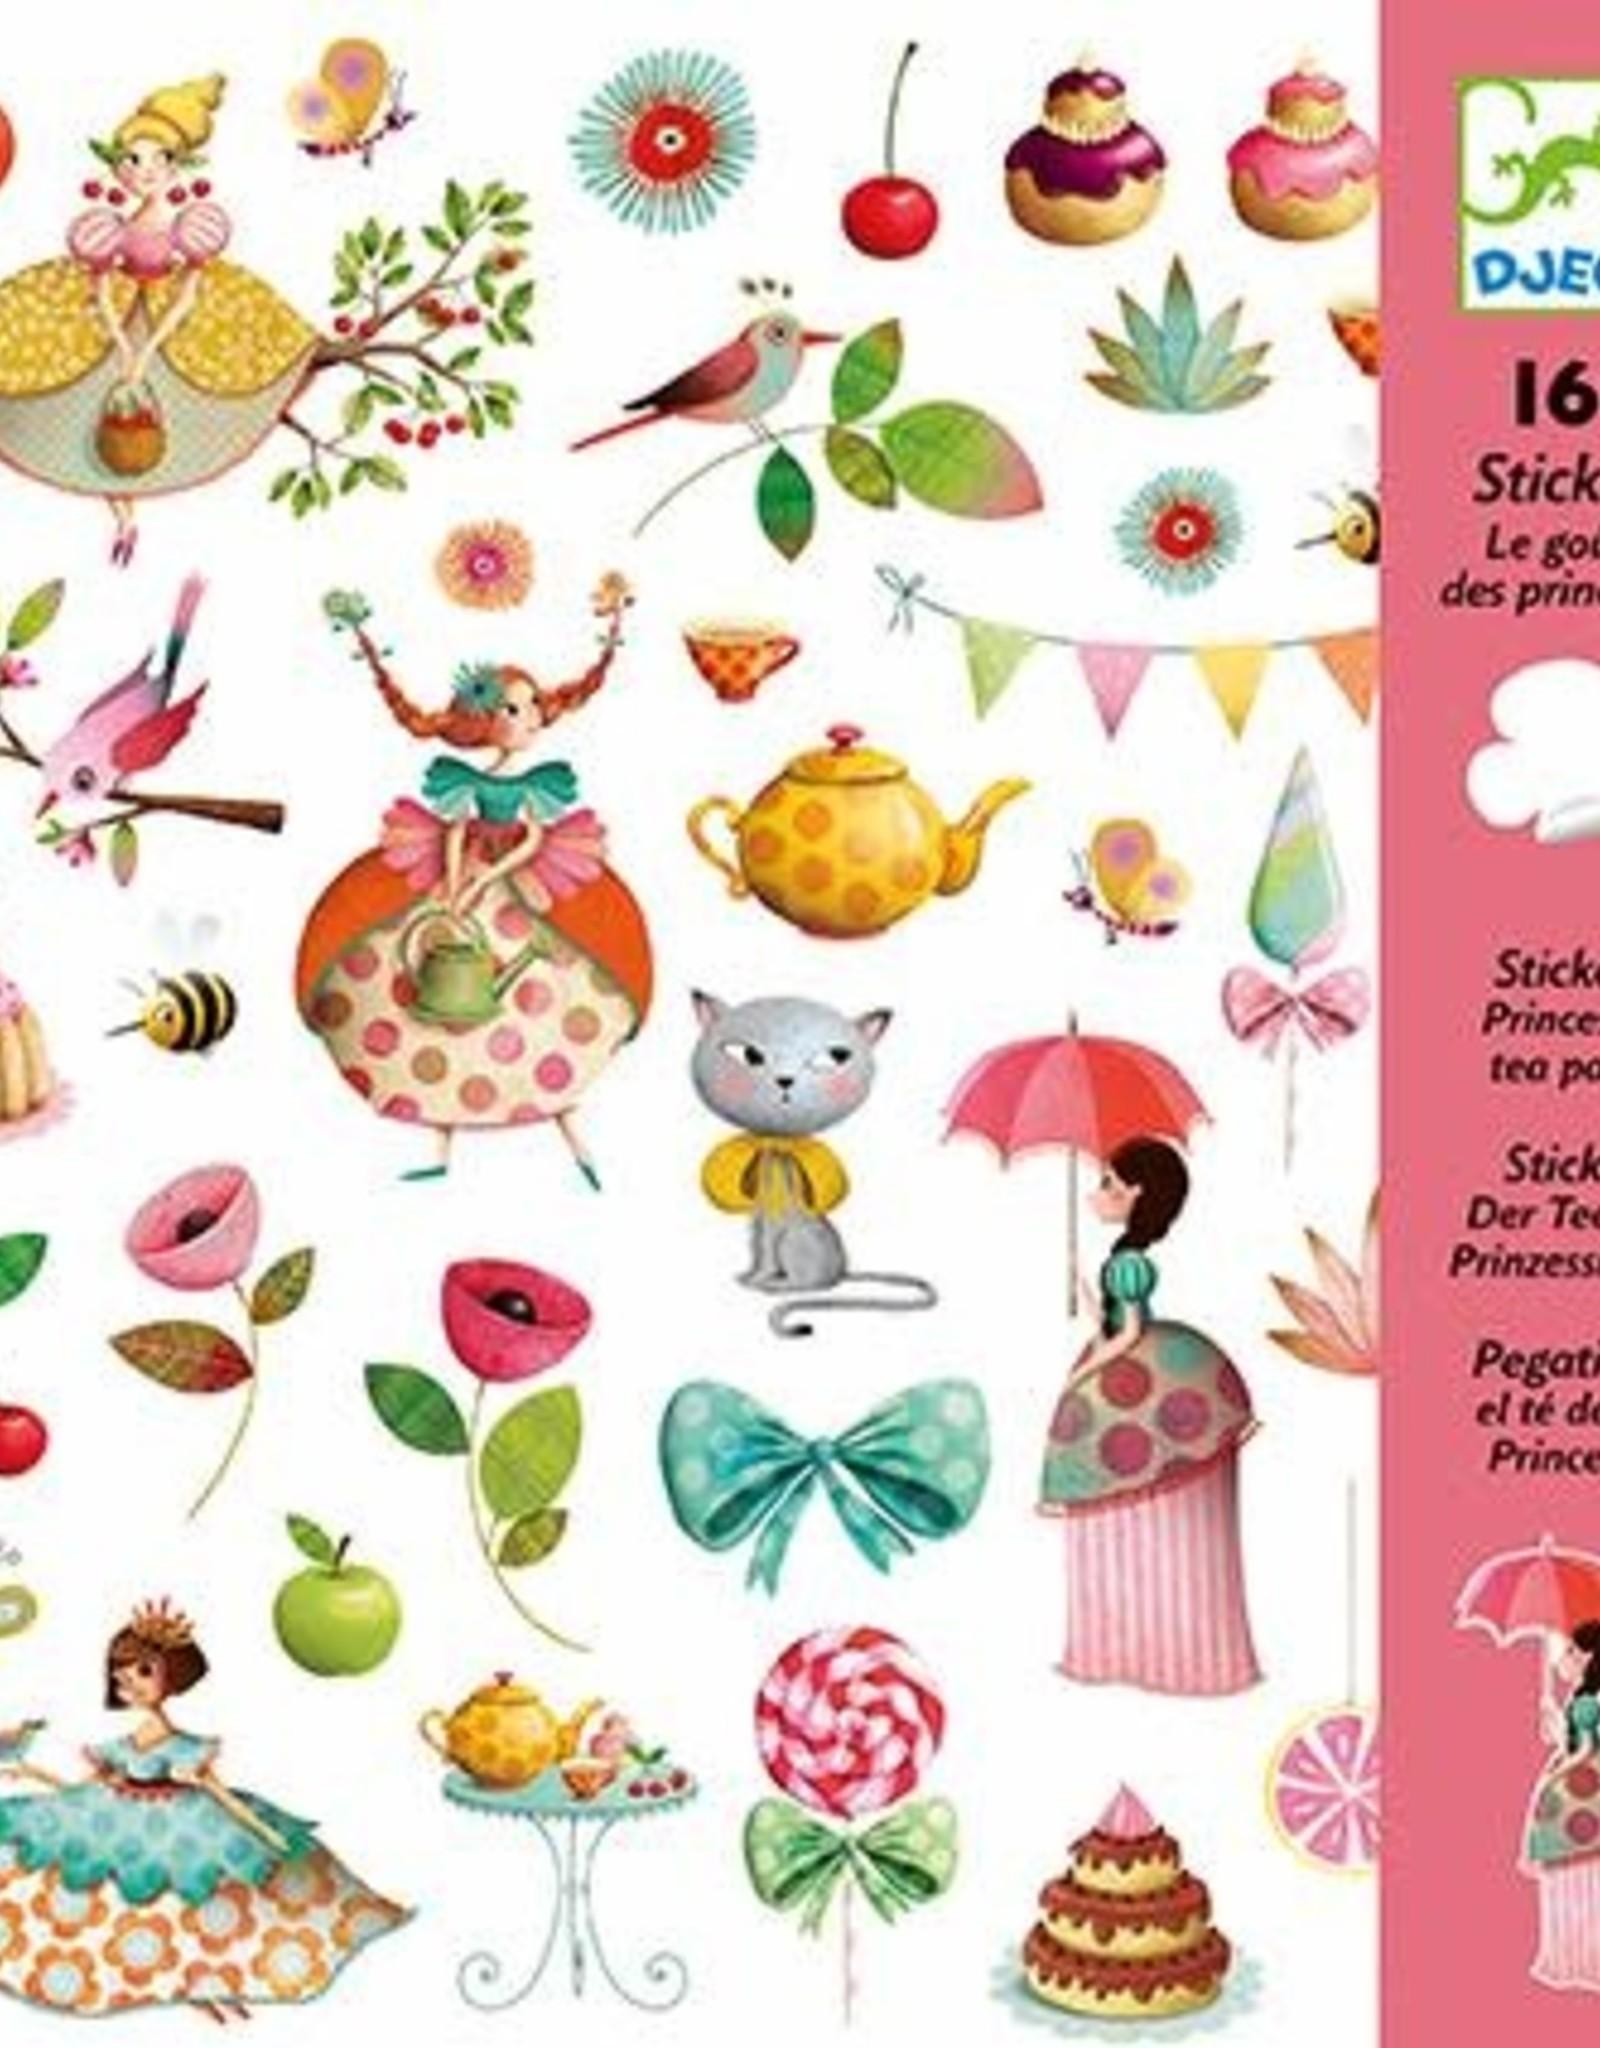 Djeco Stickers Princess Tea Party